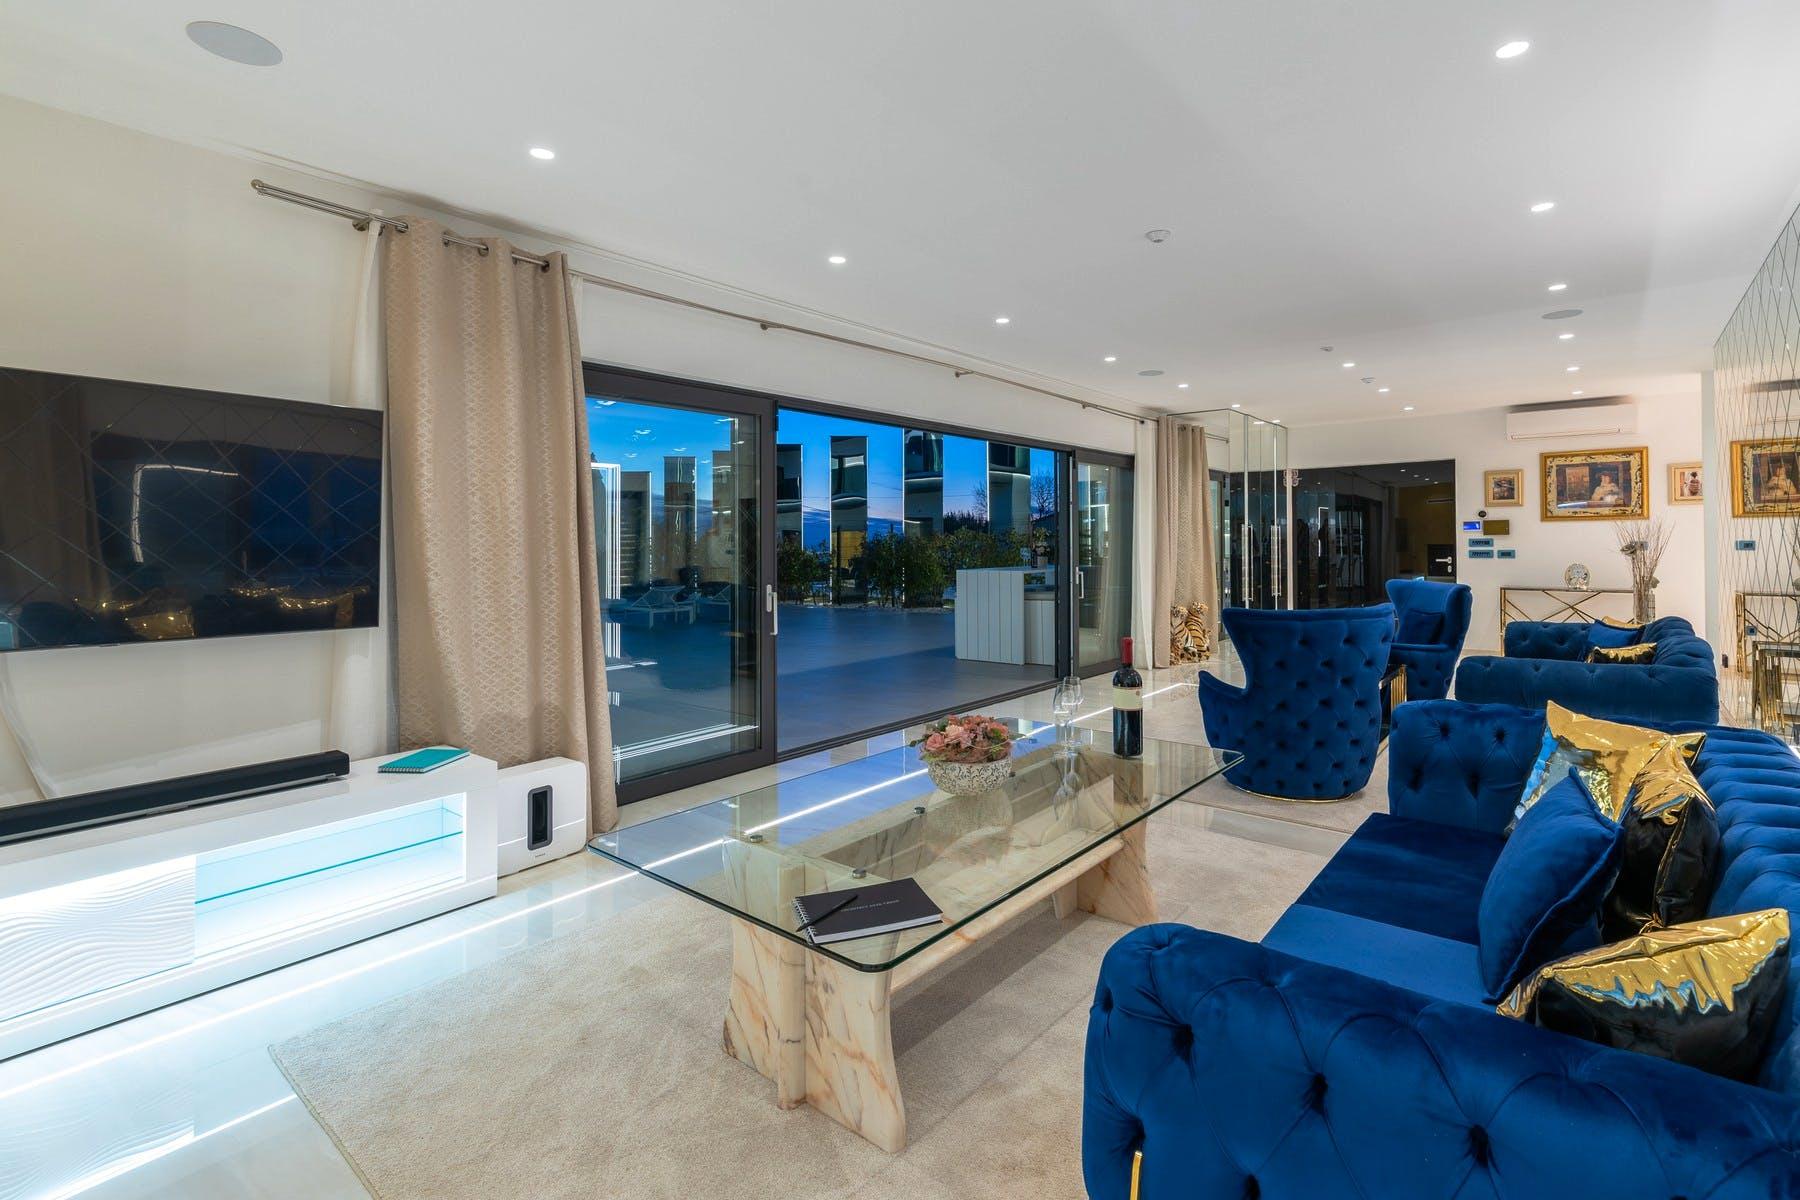 Glamorous interior design